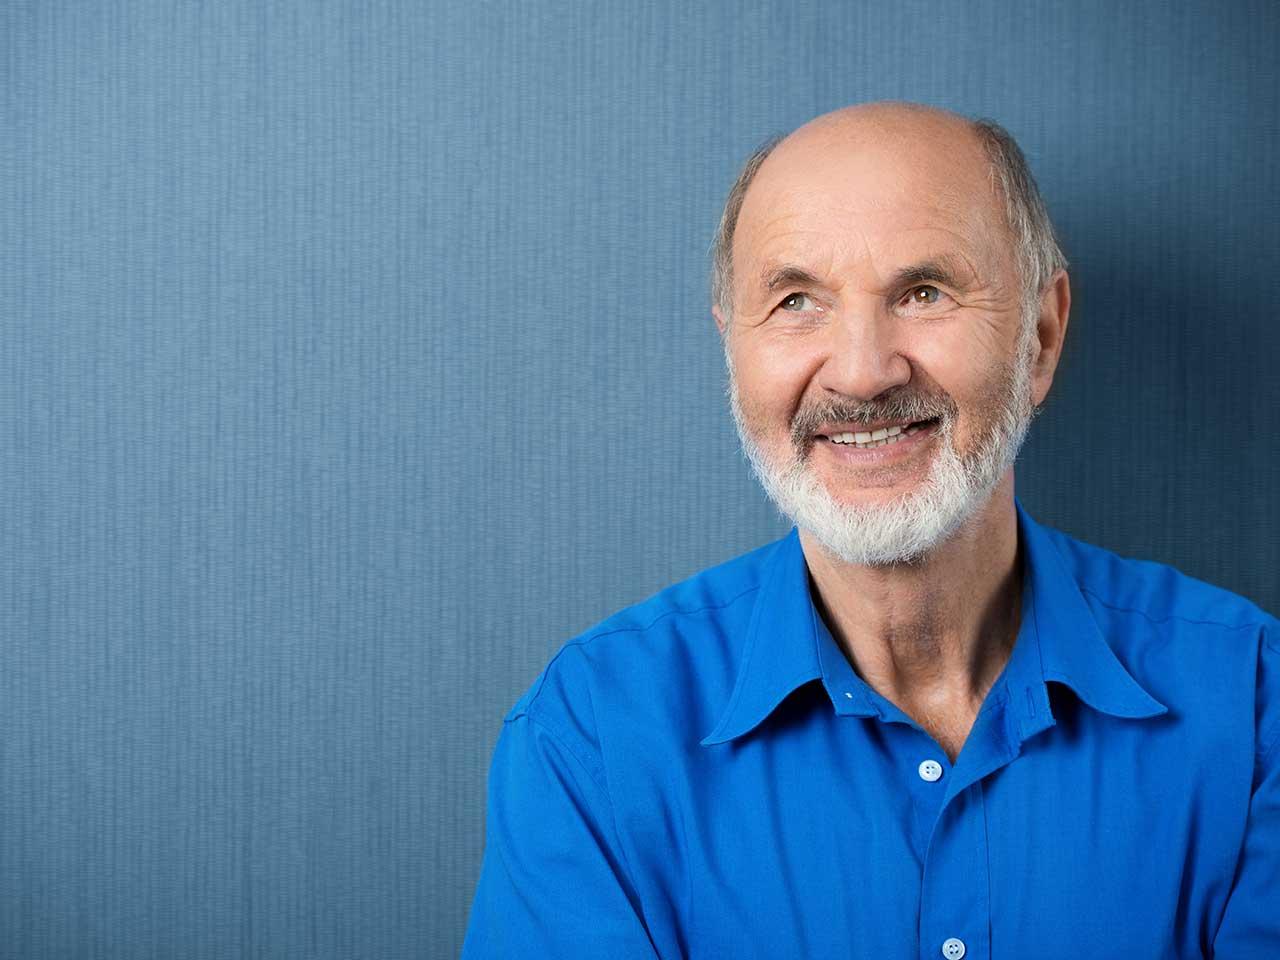 Happy Bald Senior Man Smiling